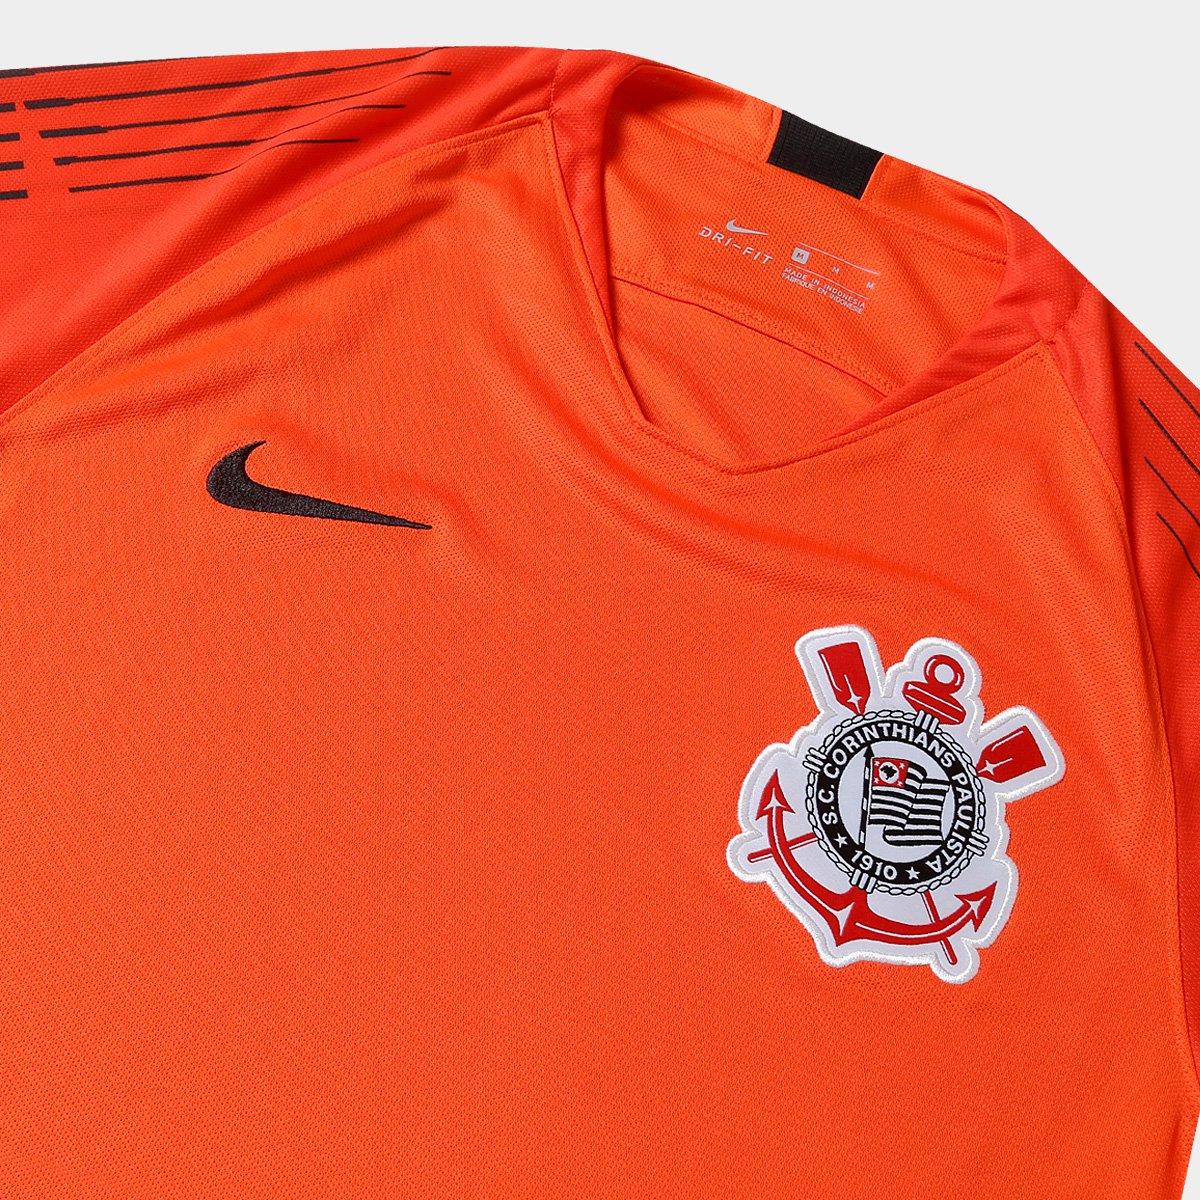 f9f54c451b Camisa de Goleiro Corinthians 2018 s n° - Torcedor Nike Masculina ...